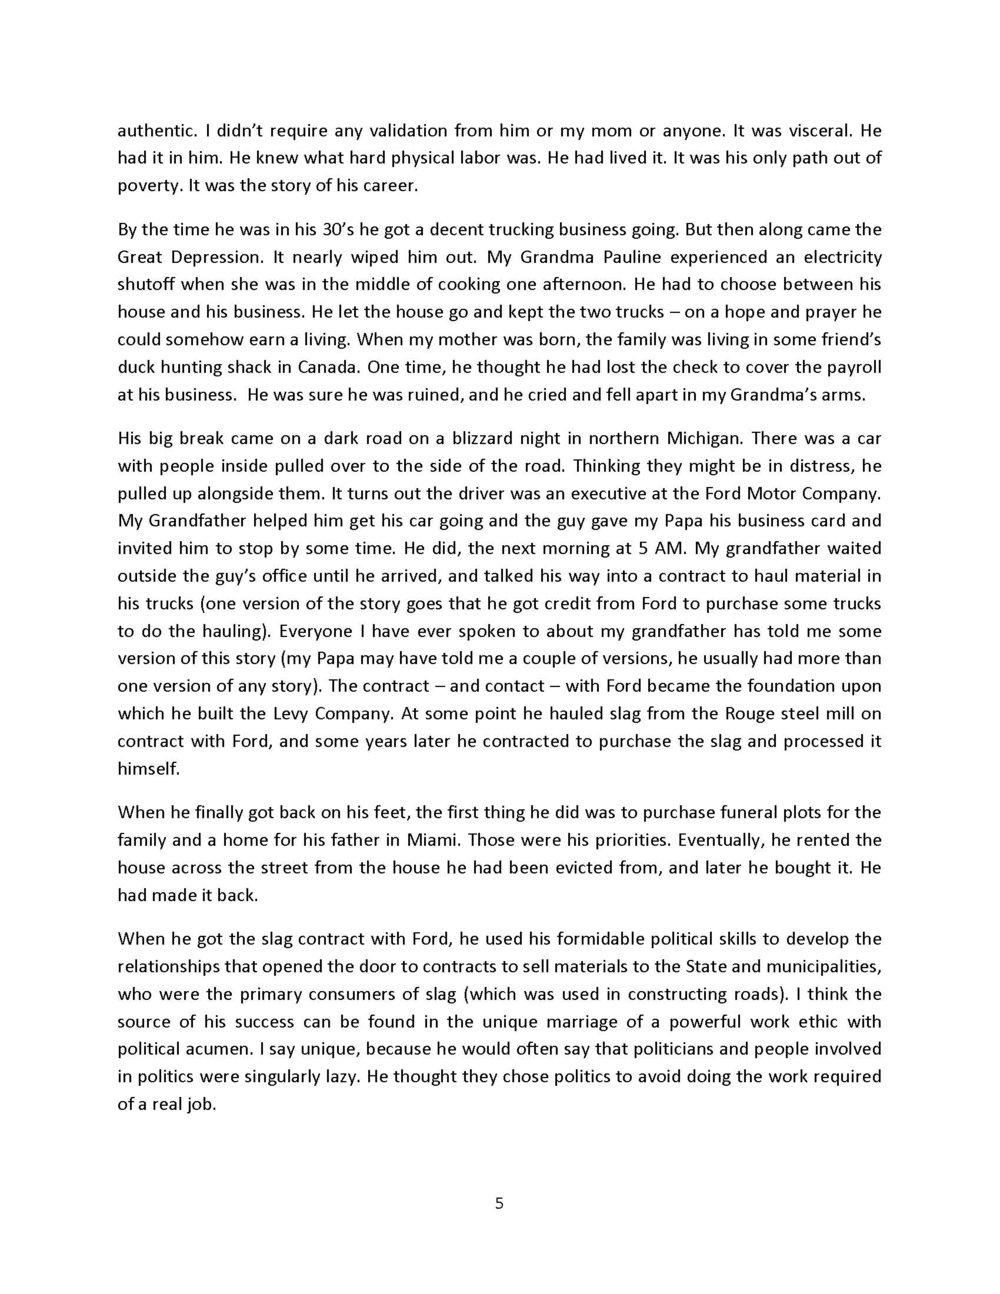 Papa Ed Stories -excerpts_Page_05.jpg